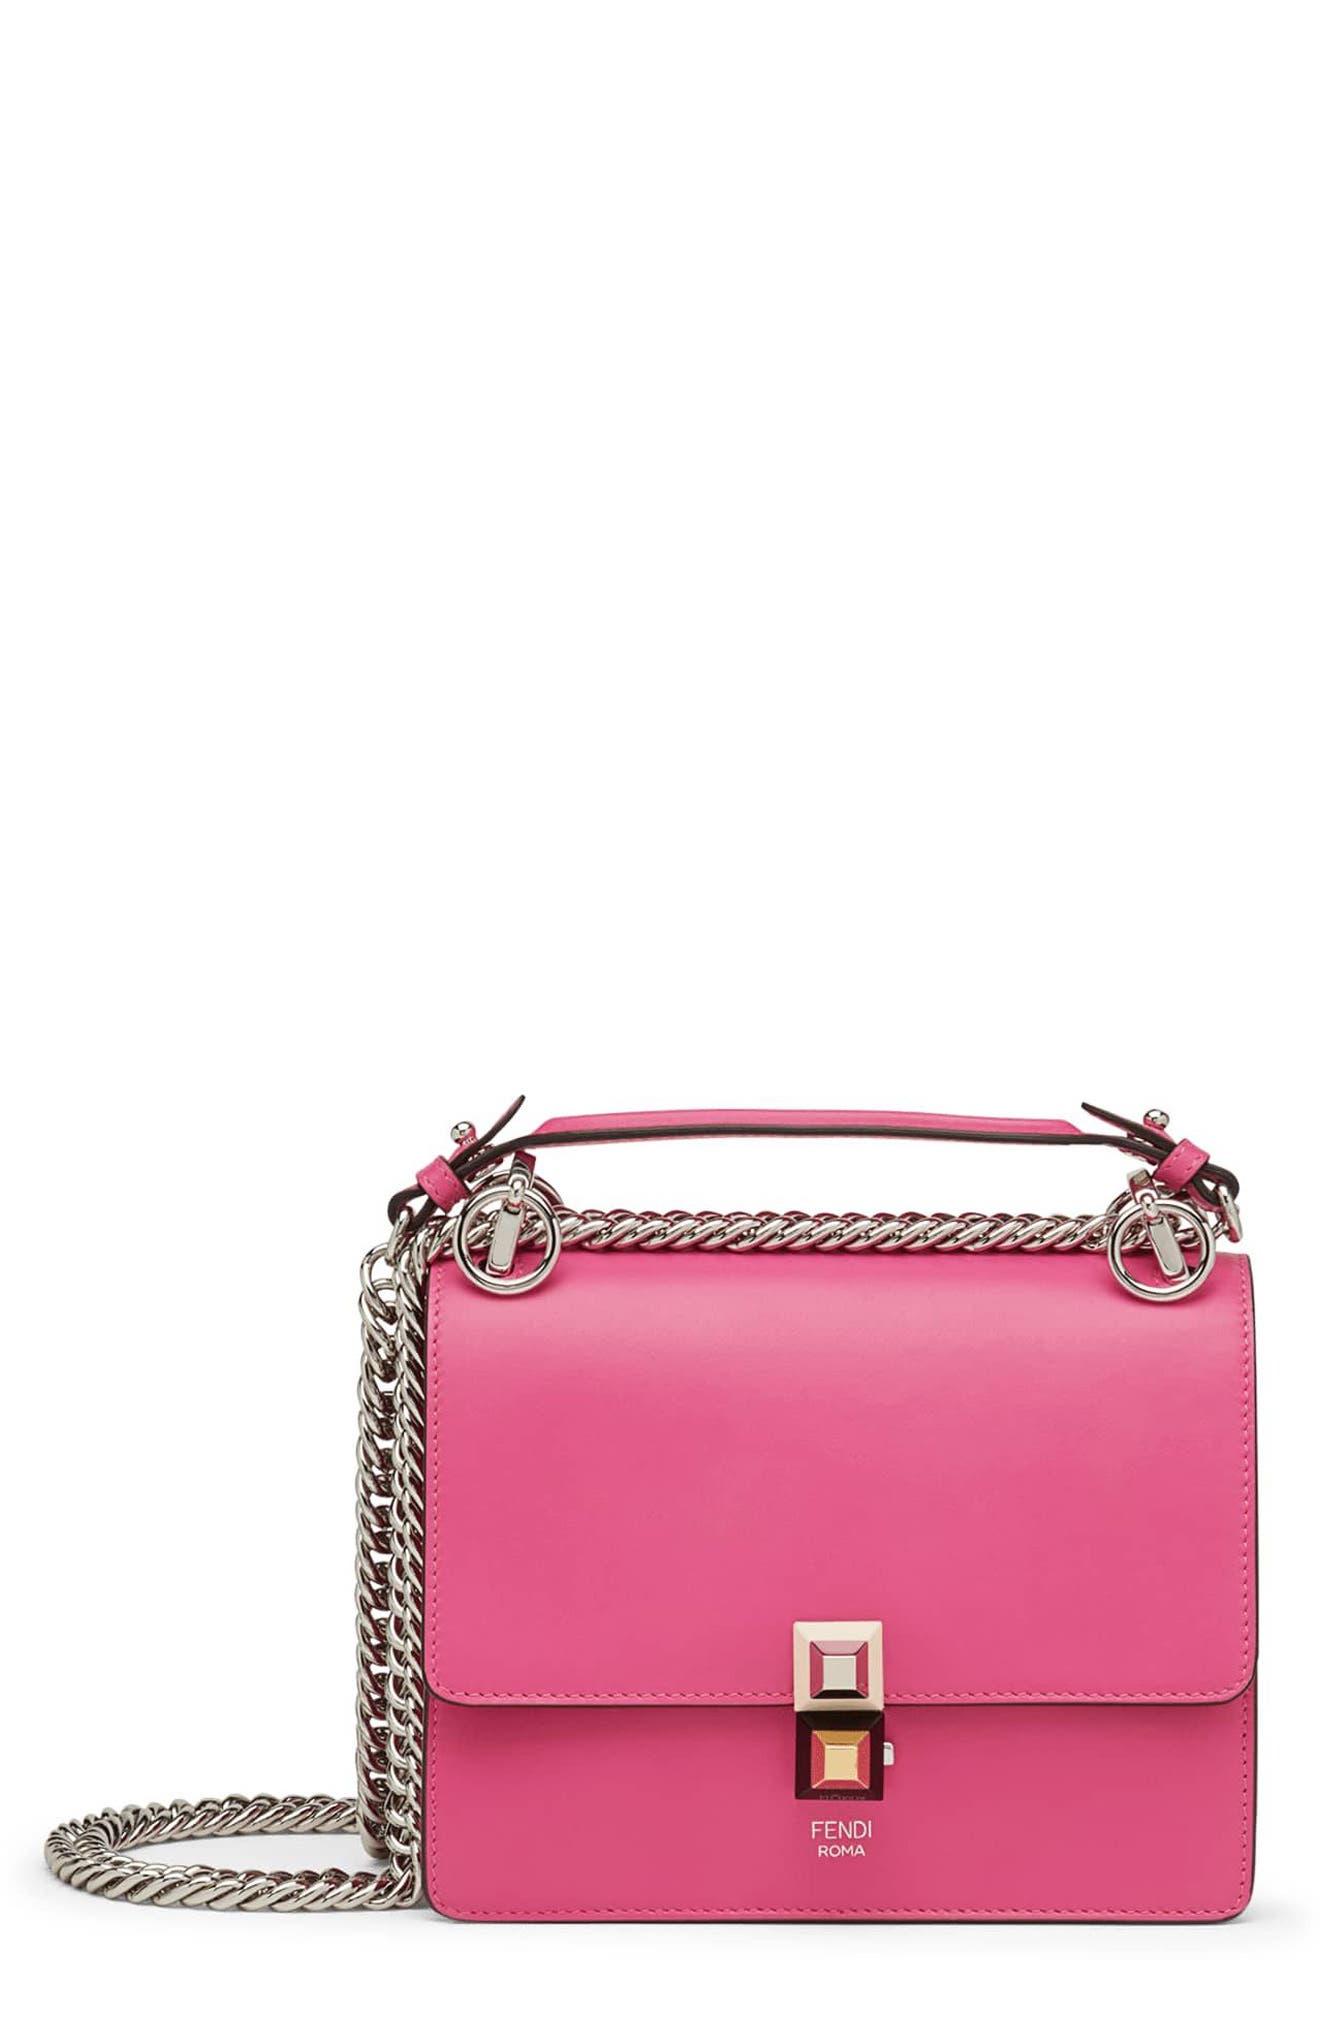 Main Image - Fendi Small Kan I Leather Shoulder Bag